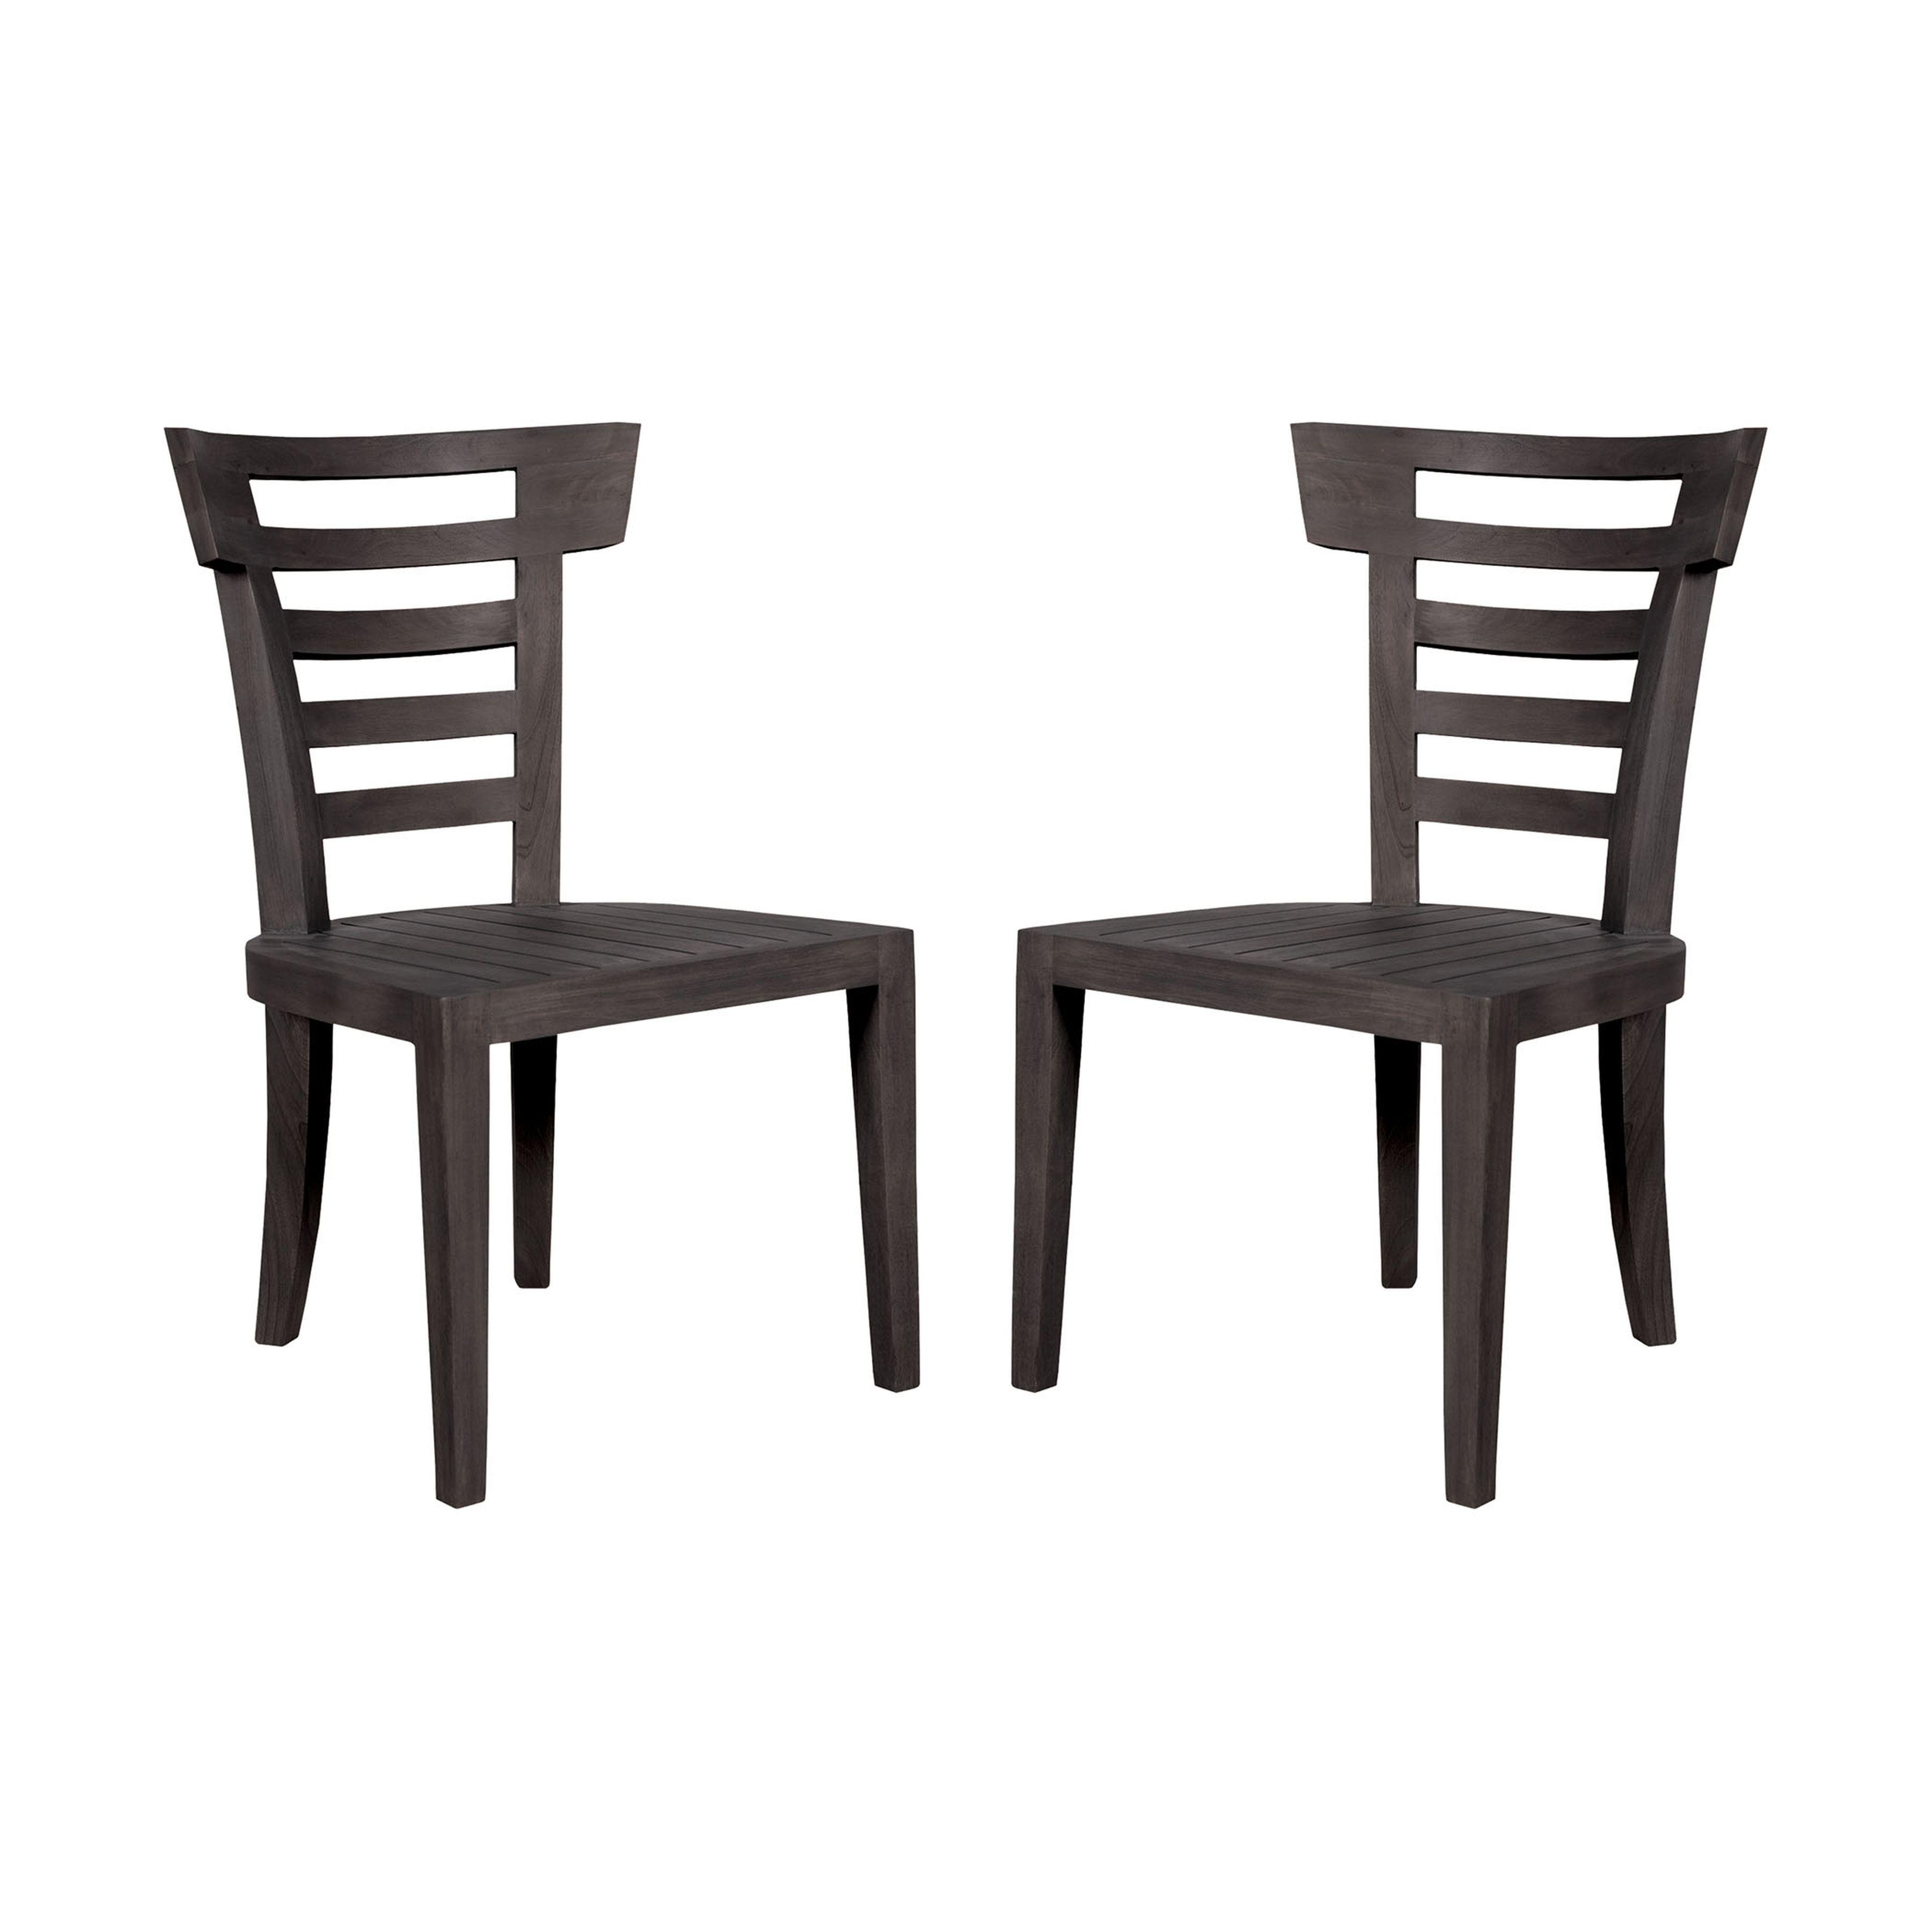 Teak Patio Outdoor Morning Chair Set of 2 6917502P-AS | ELK Home